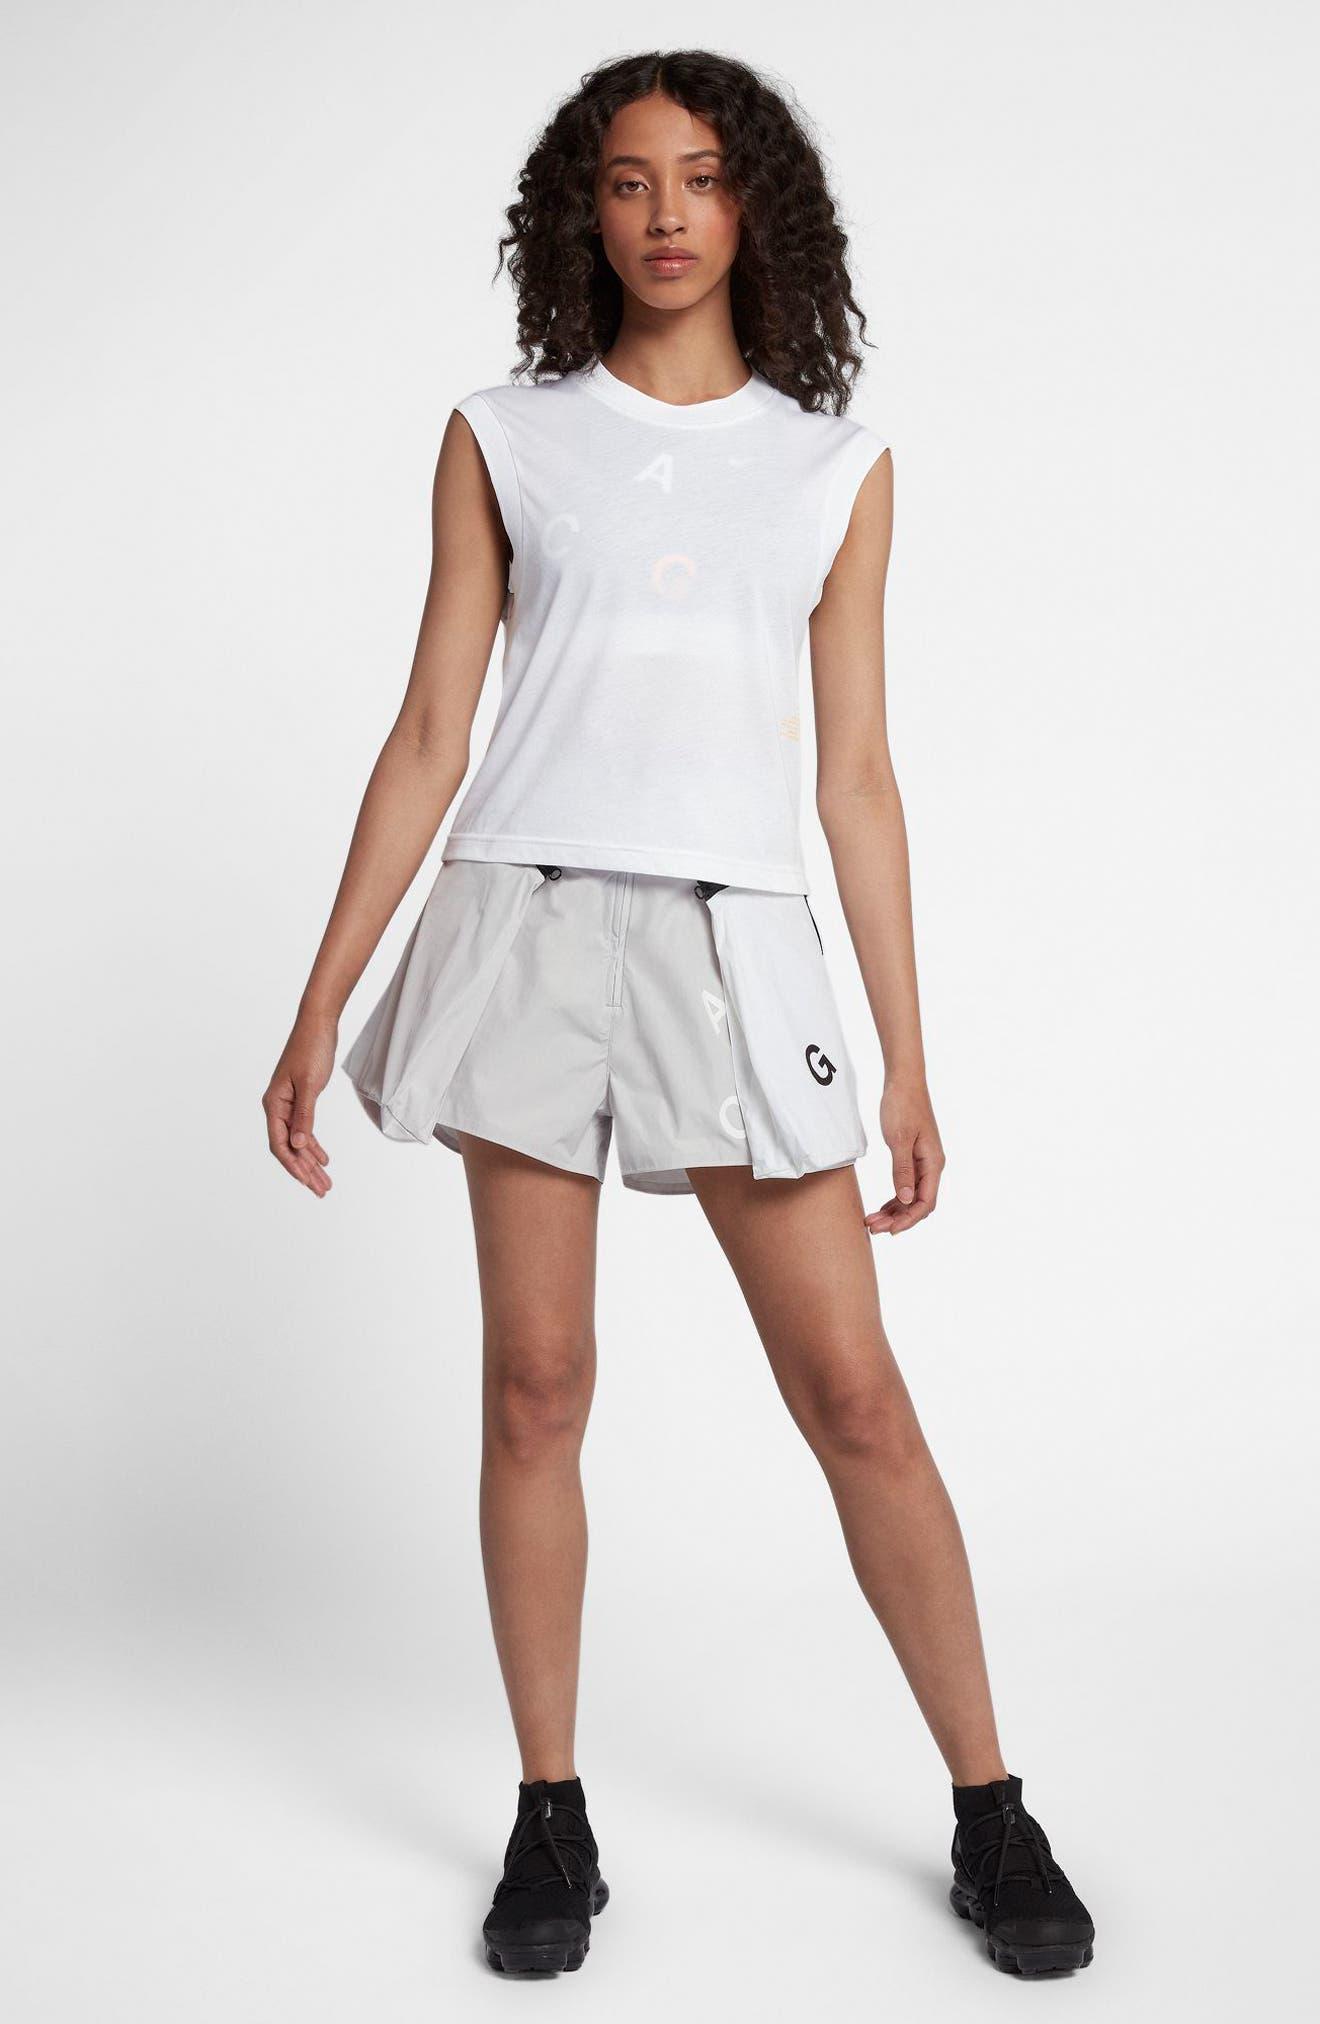 NikeLab ACG Women's Sleeveless Top,                             Alternate thumbnail 7, color,                             White